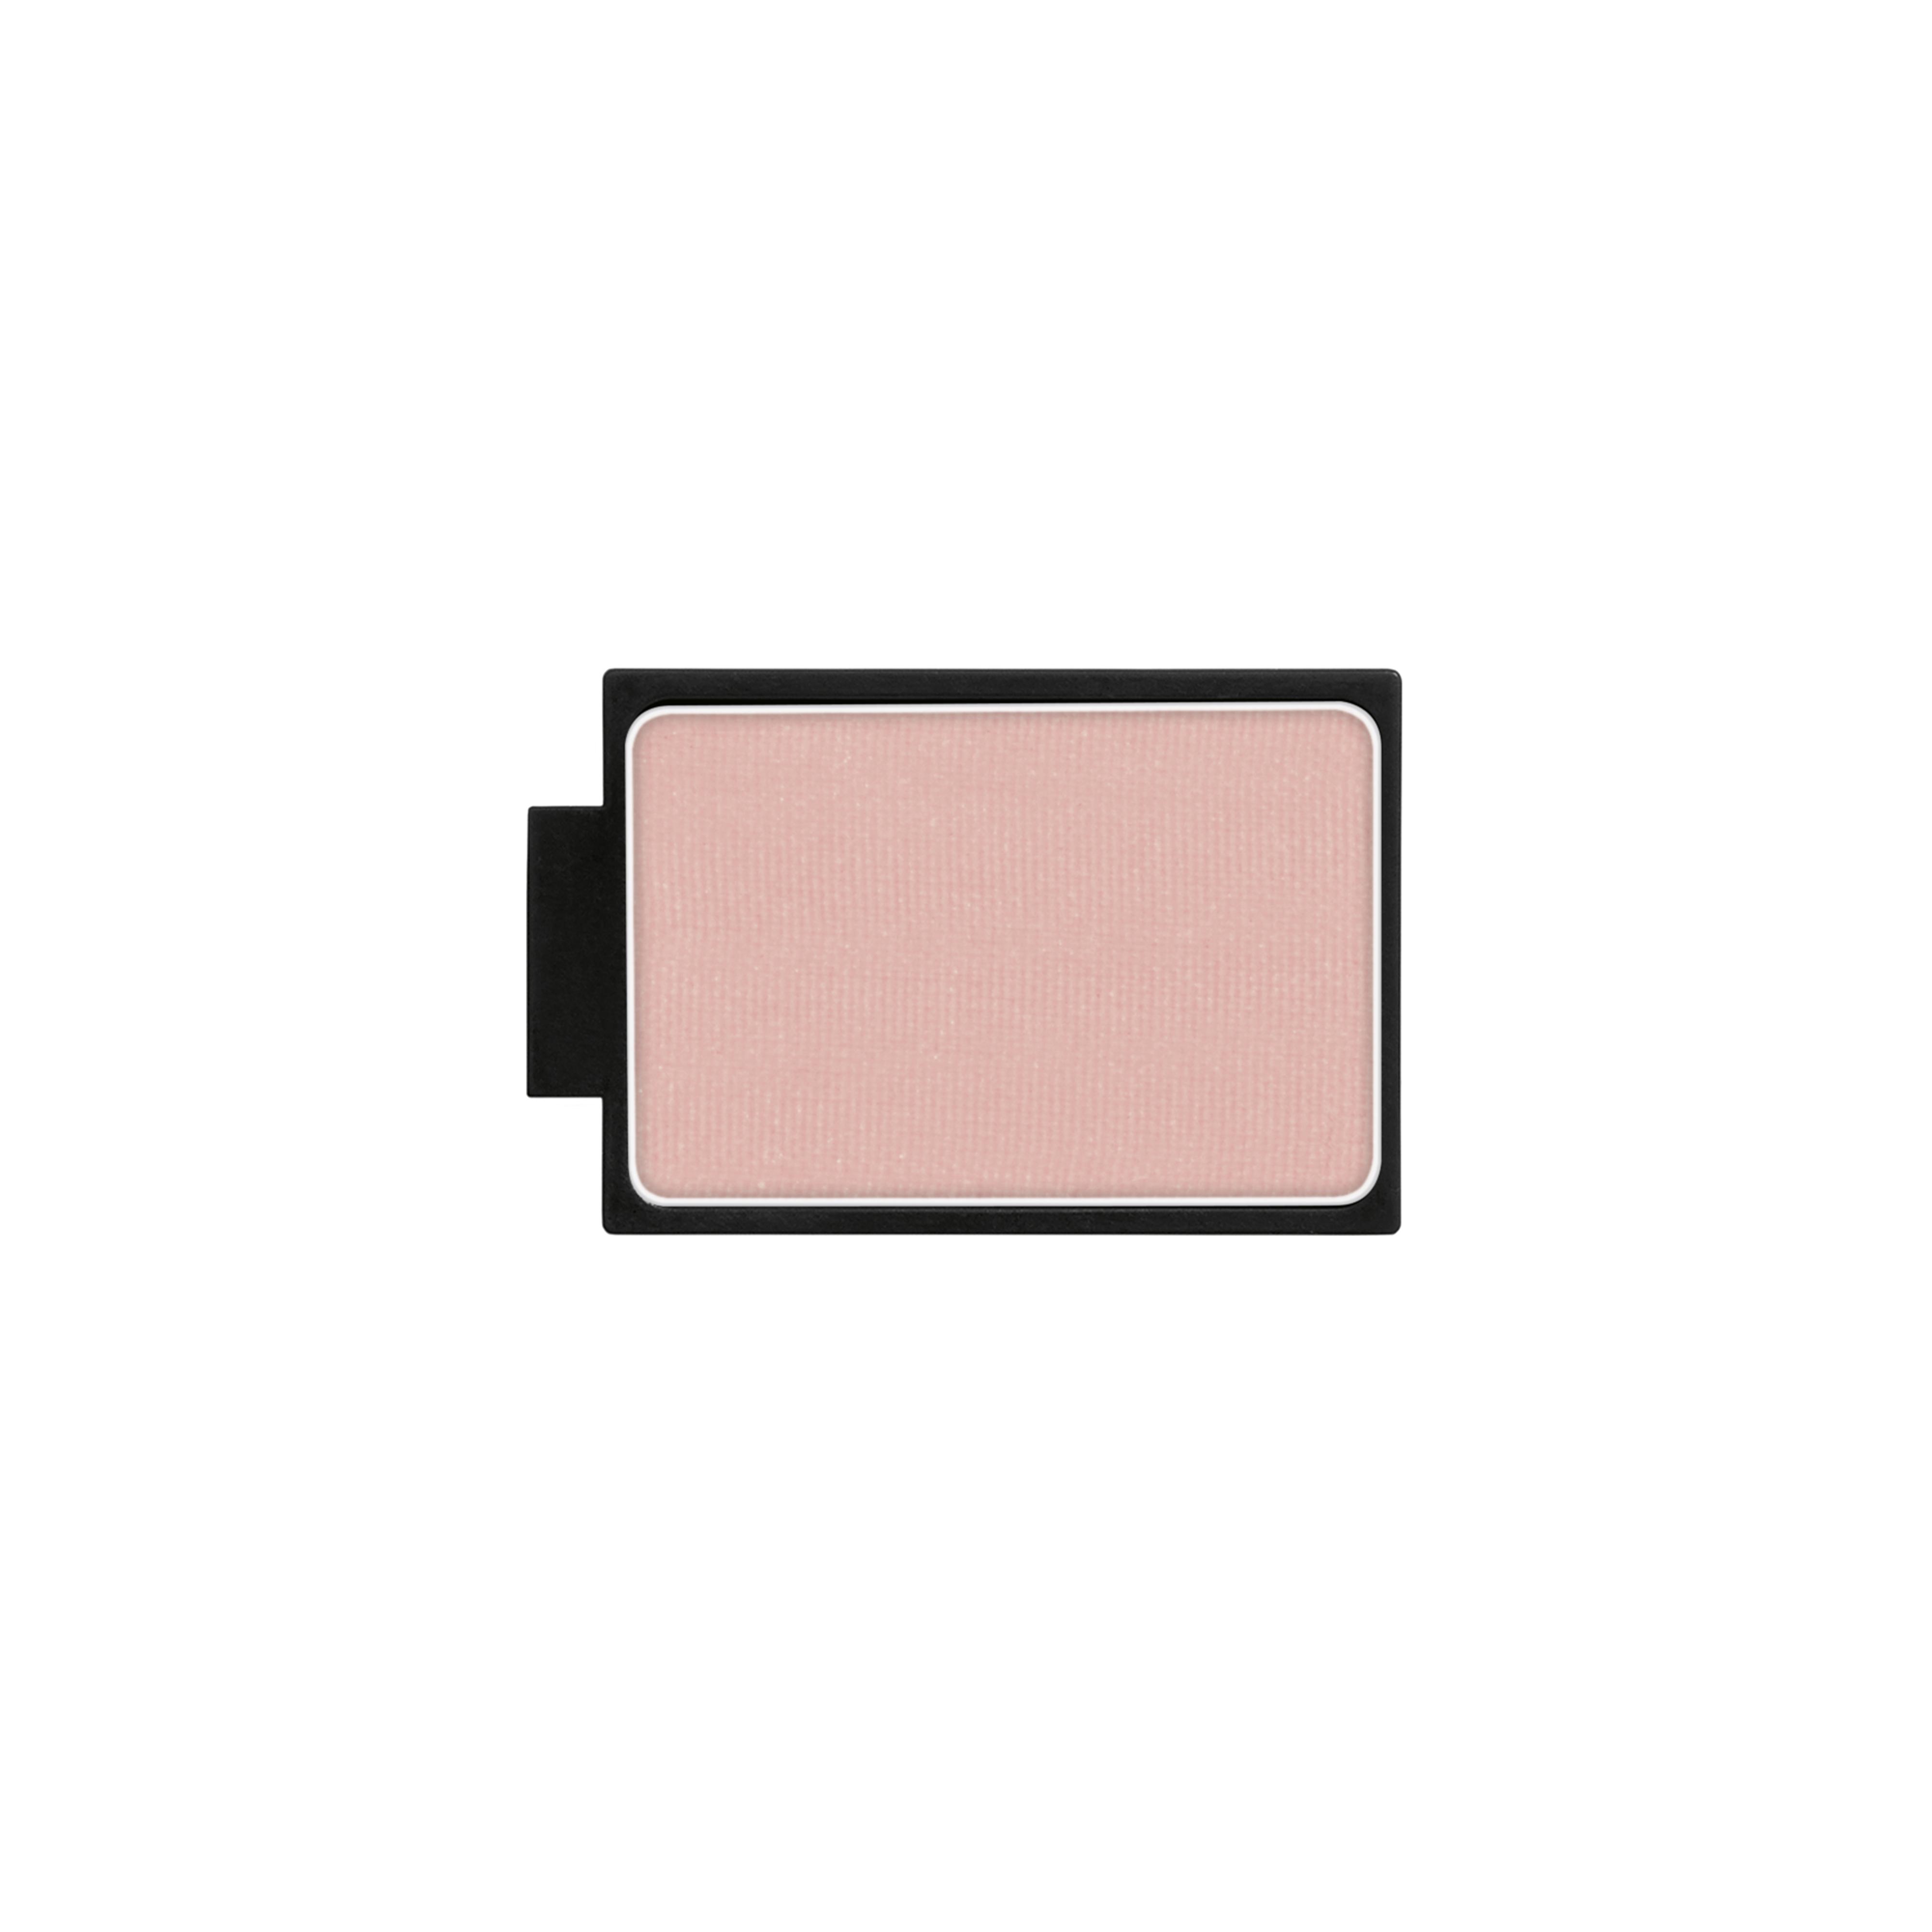 Single Bar Shade Feather Boa (Matte pastel pink)